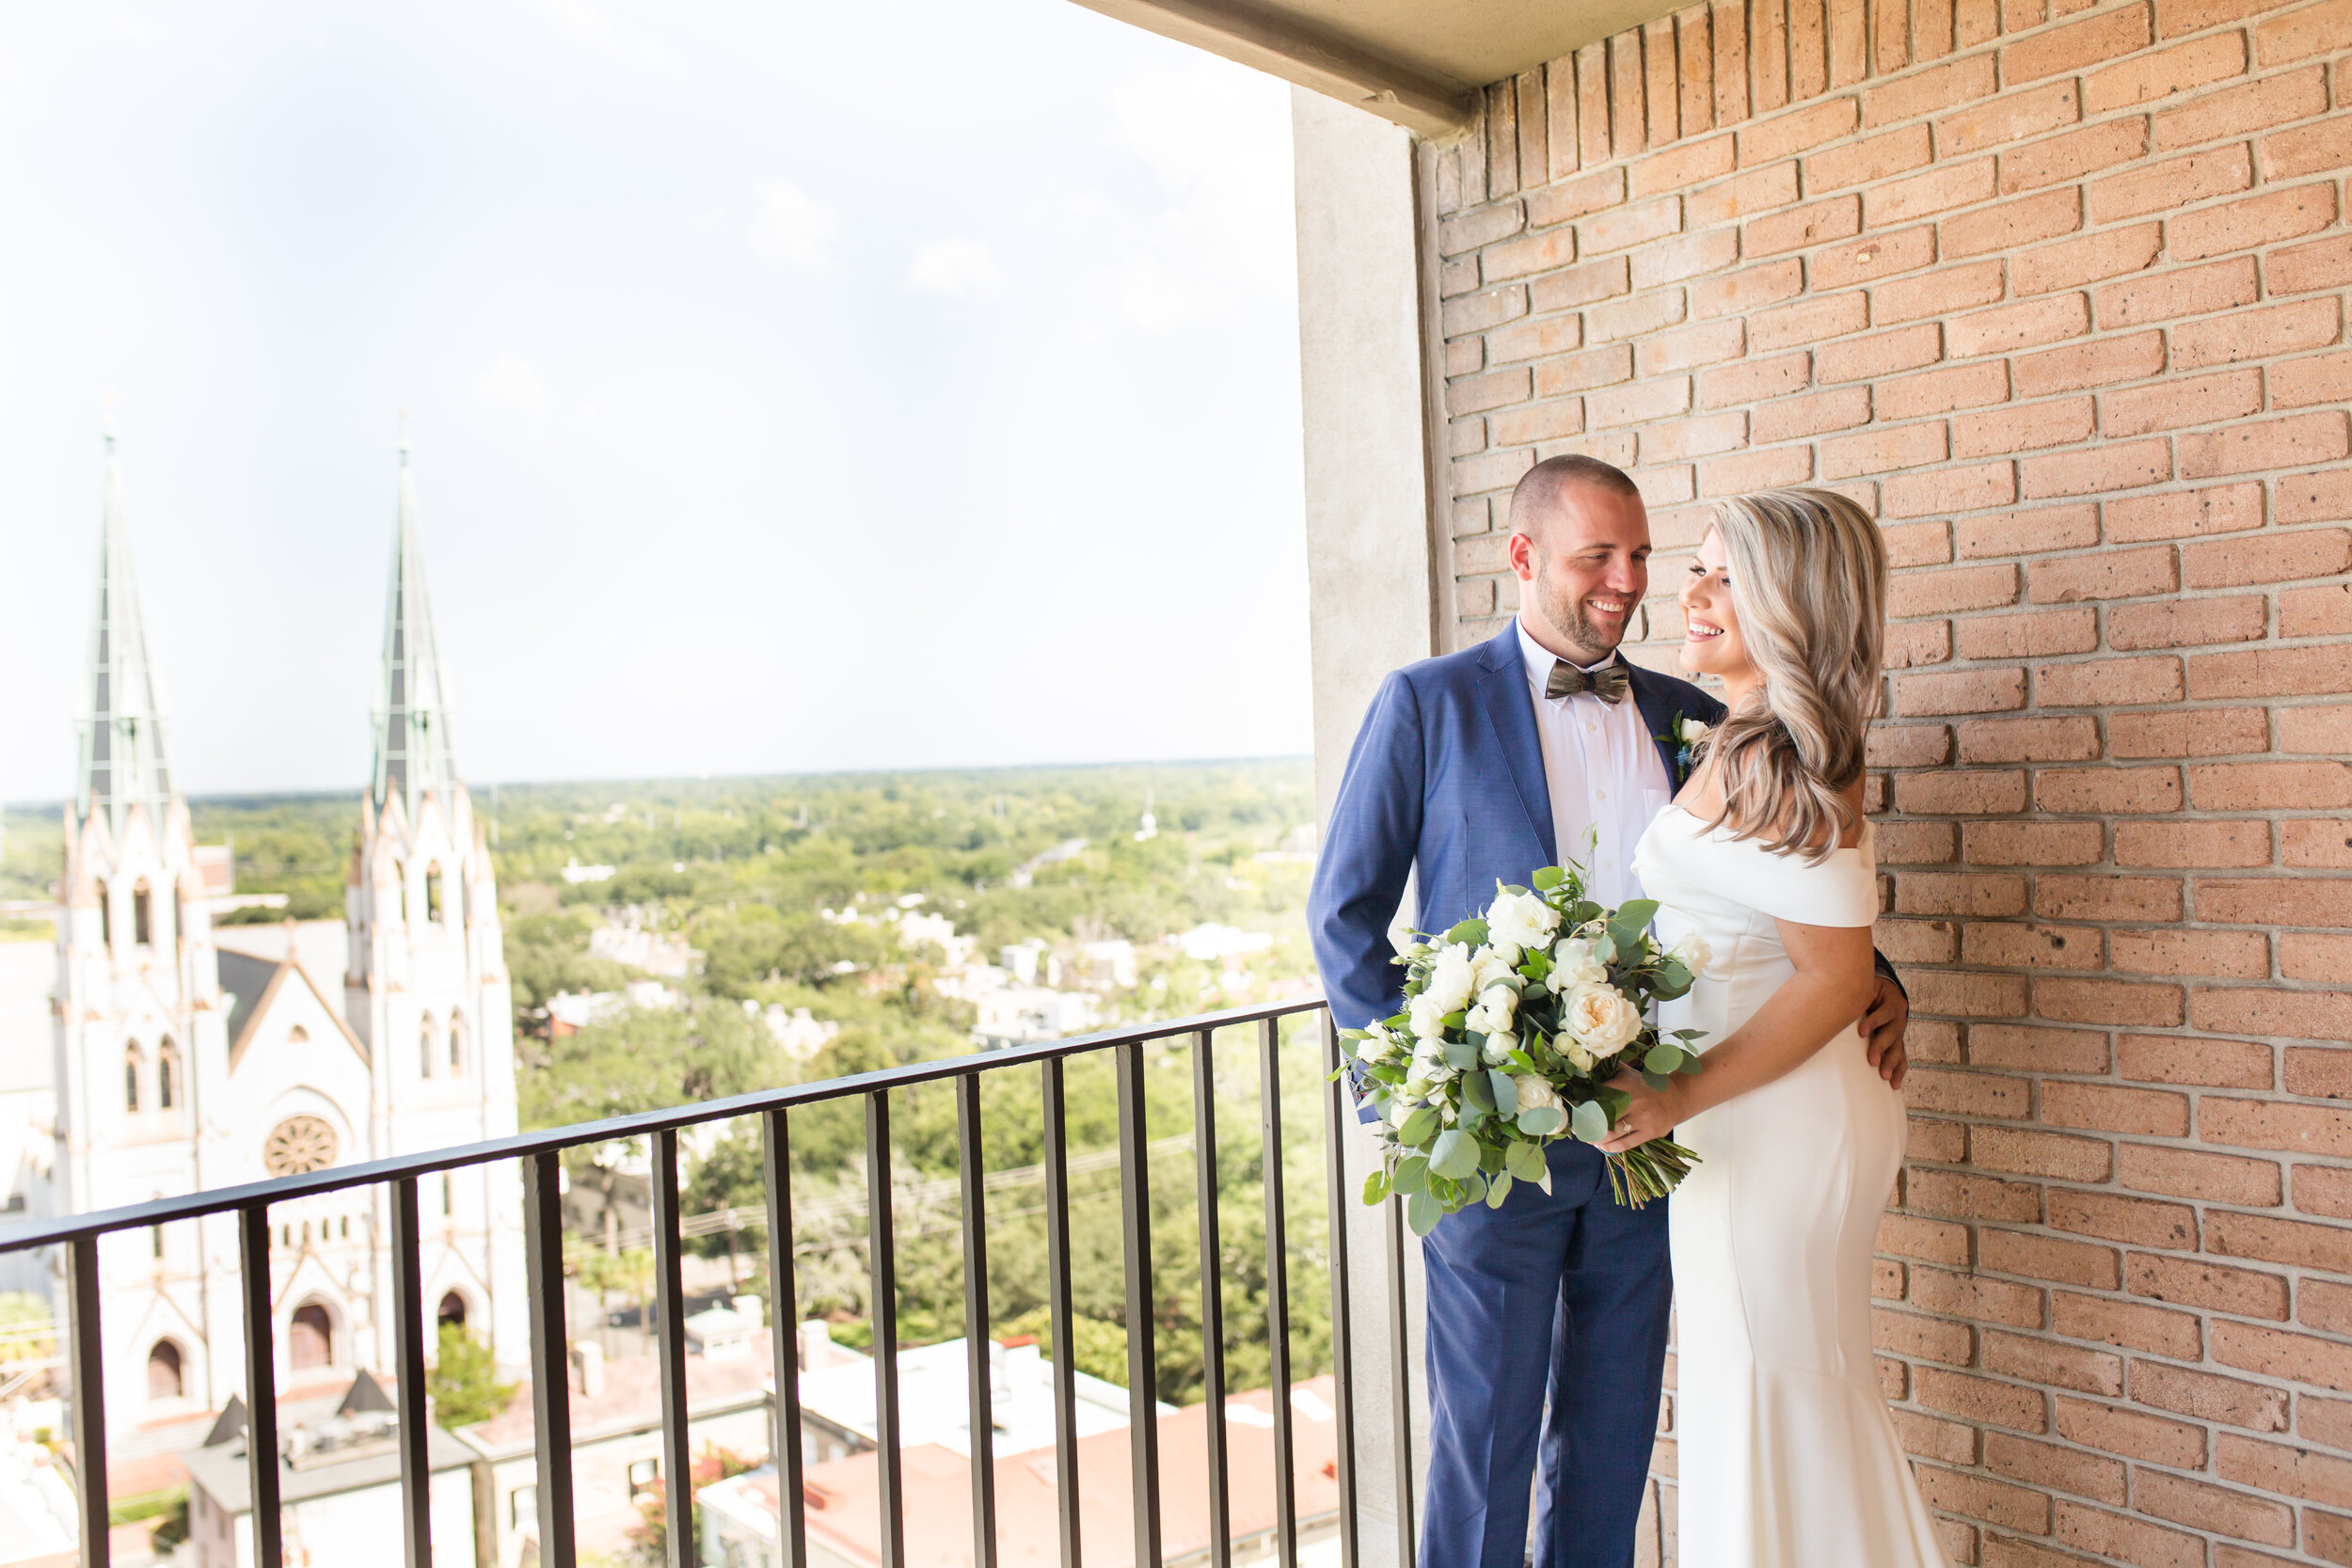 ivory-and-beau-bride-wedding-dresses-bridal-boutique-bridal-shop-savannah-wedding-shop-DGP_SohoSouthCafe_Swanagin-Mullis-117.JPG